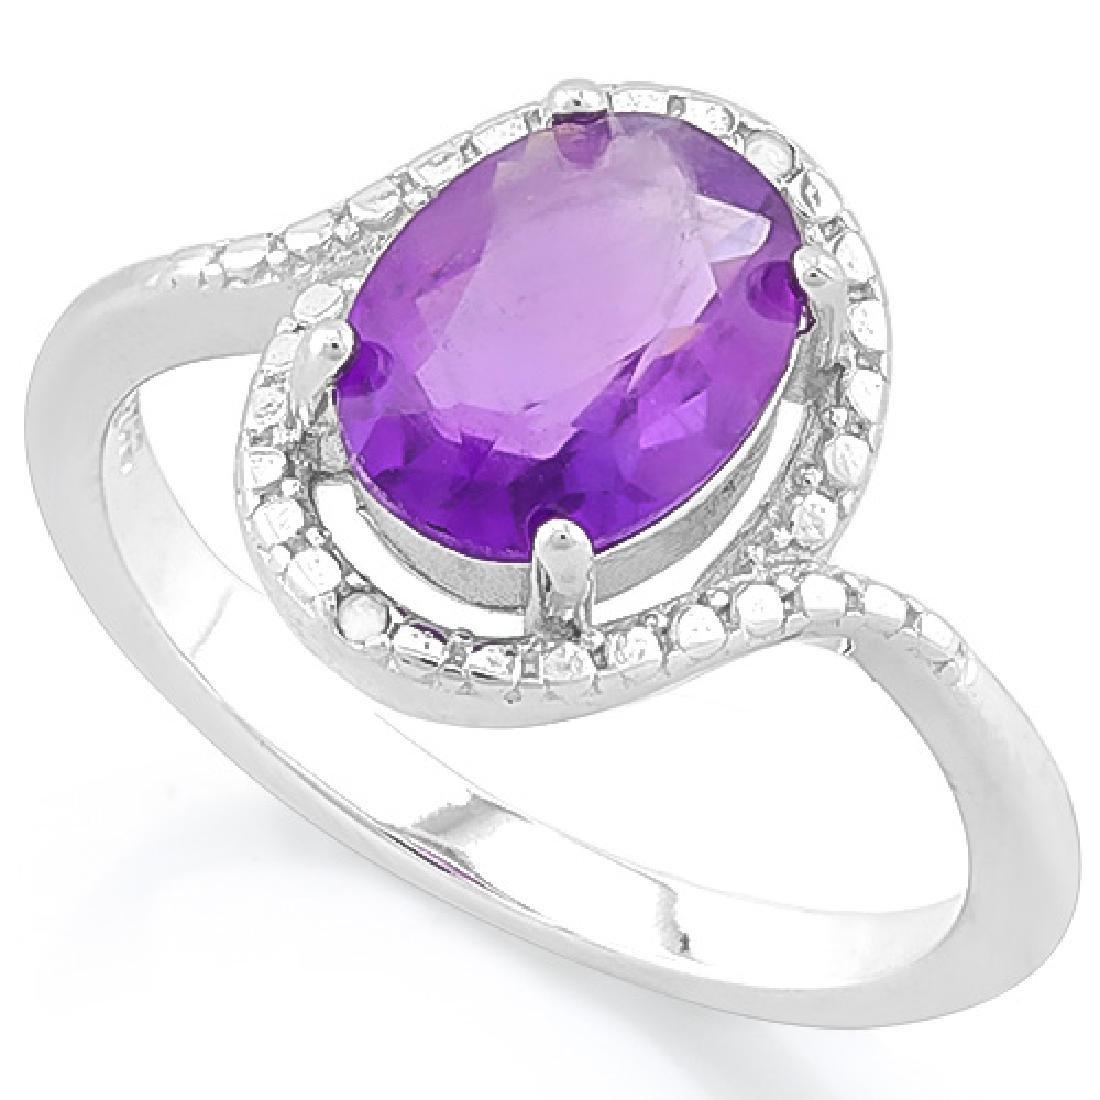 1 3/5 CARAT AMETHYST & GENUINE DIAMONDS 925 STERLING SI